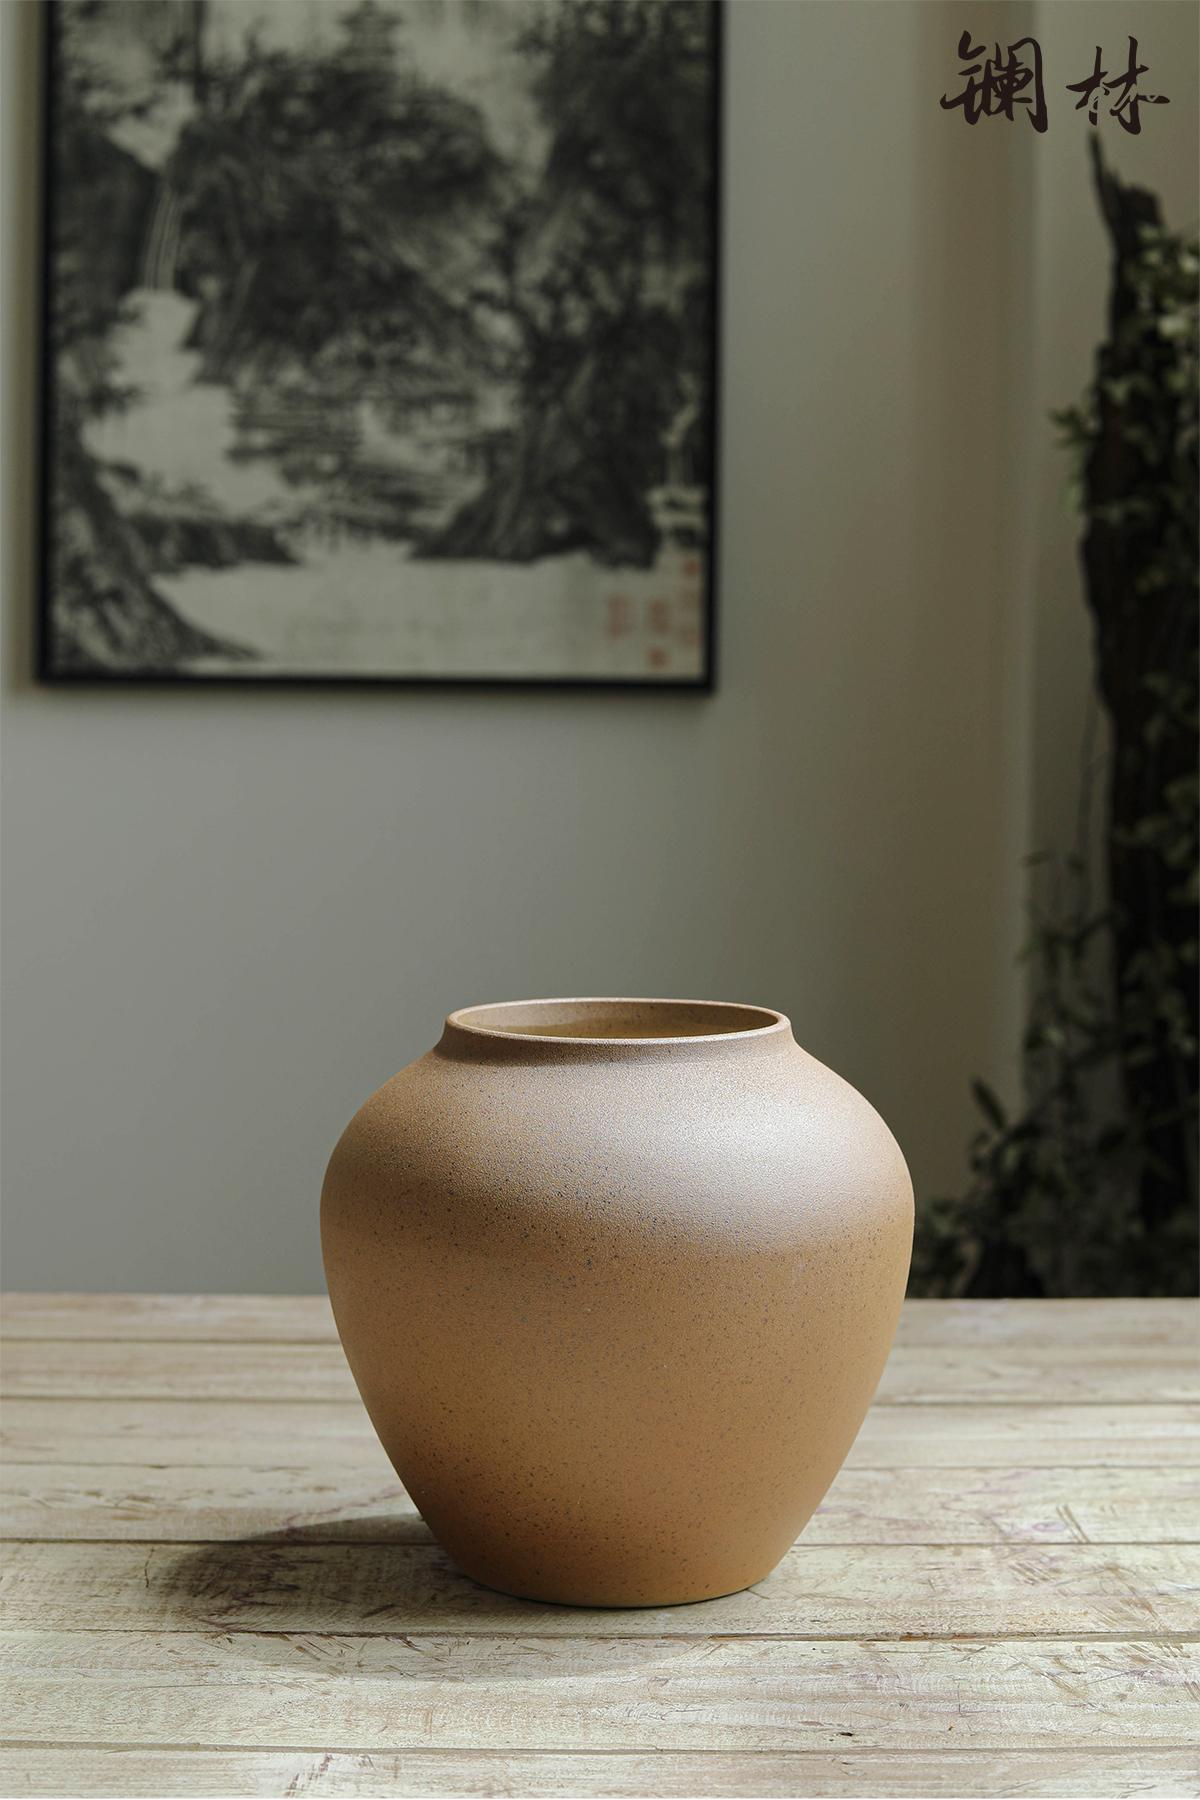 Dry flower is plain coloured coarse pottery vase office decoration to the hotel teahouse study zen mesa place ceramic POTS